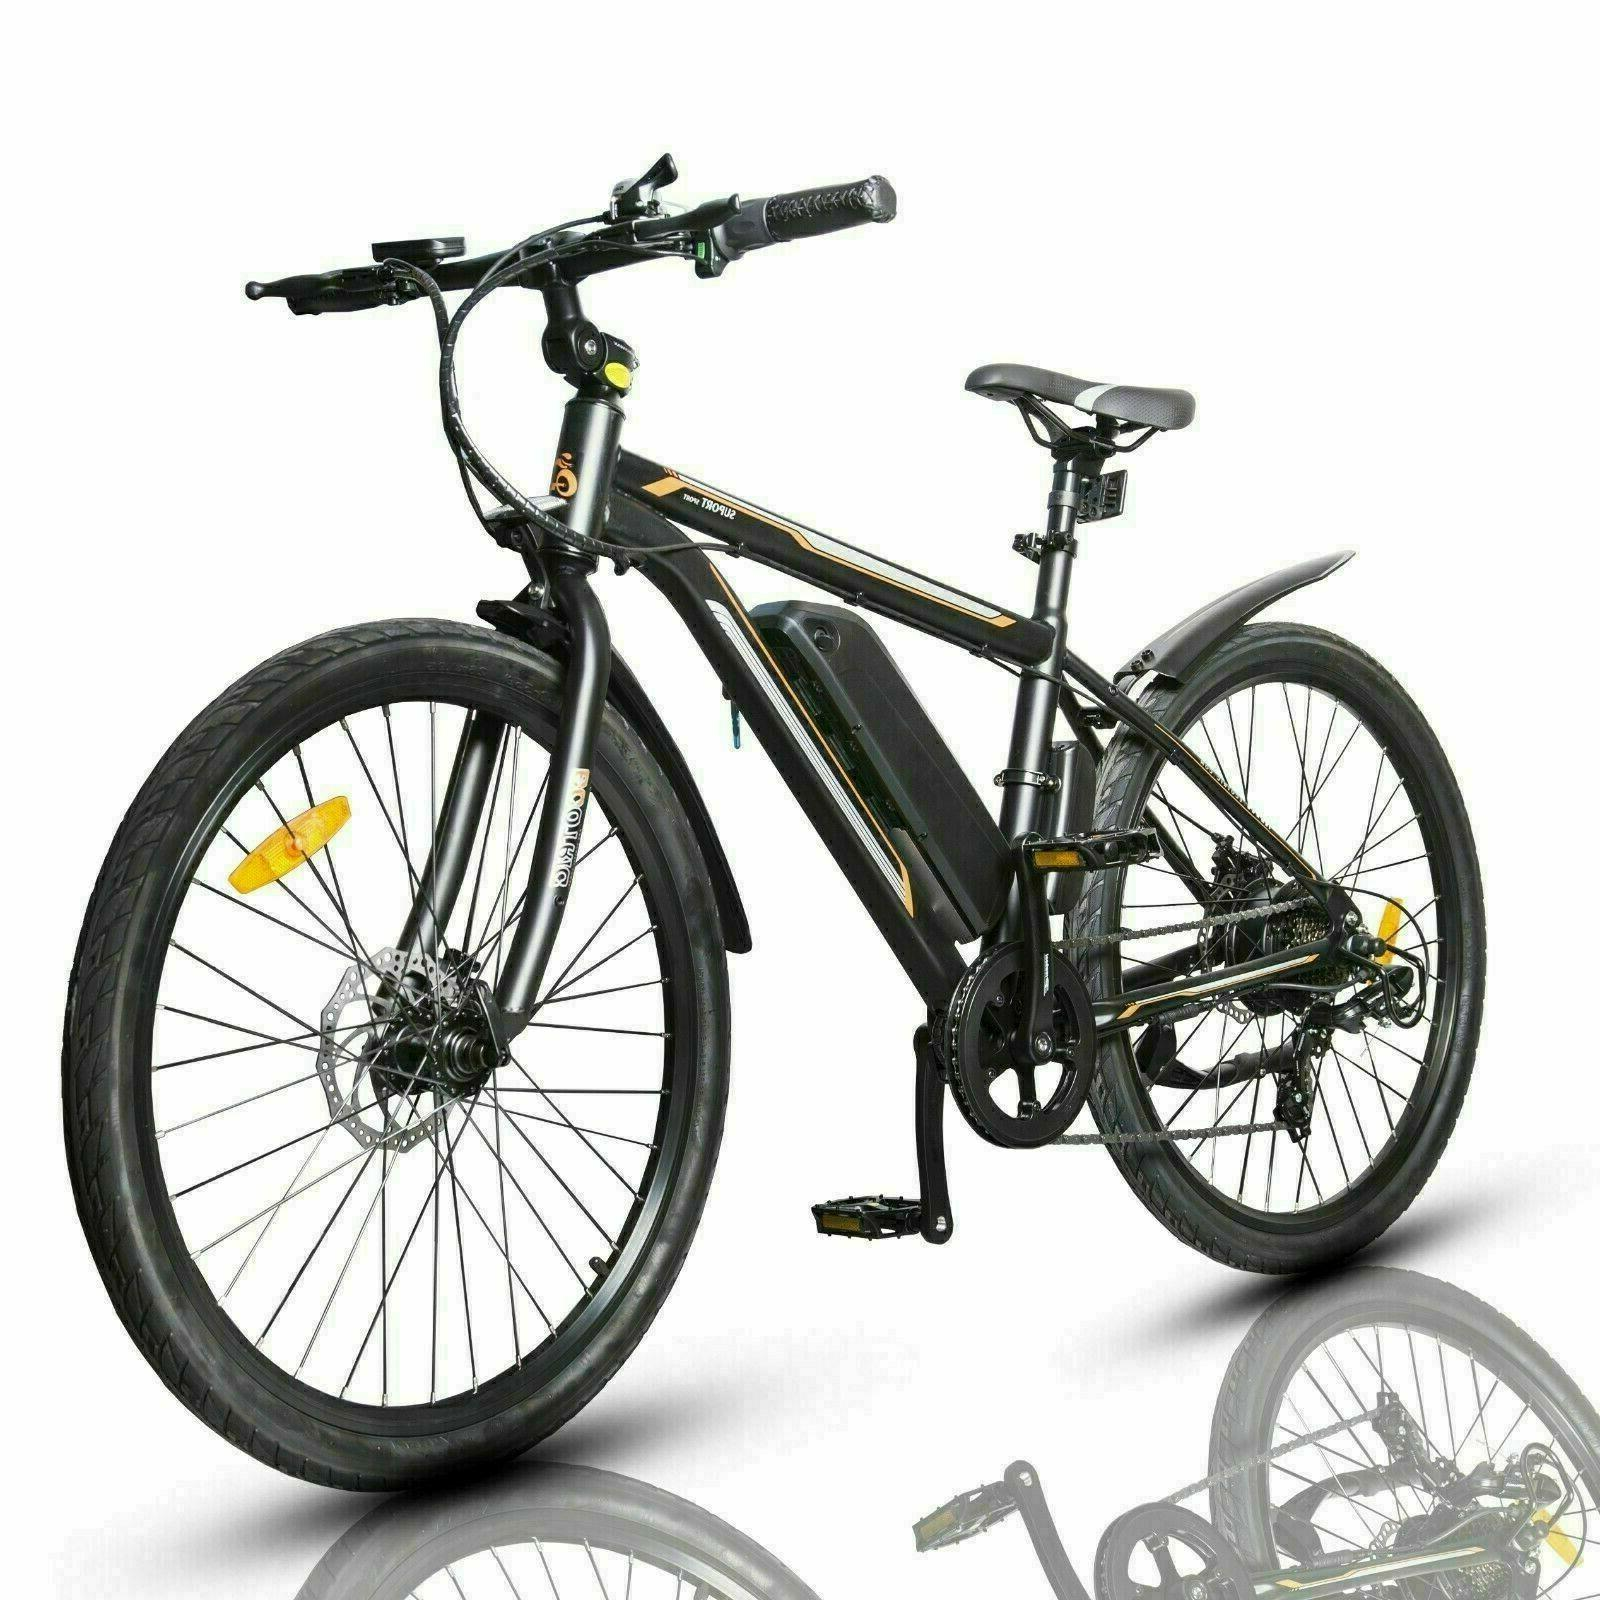 36v 350w litium ion vogue electric bicycle